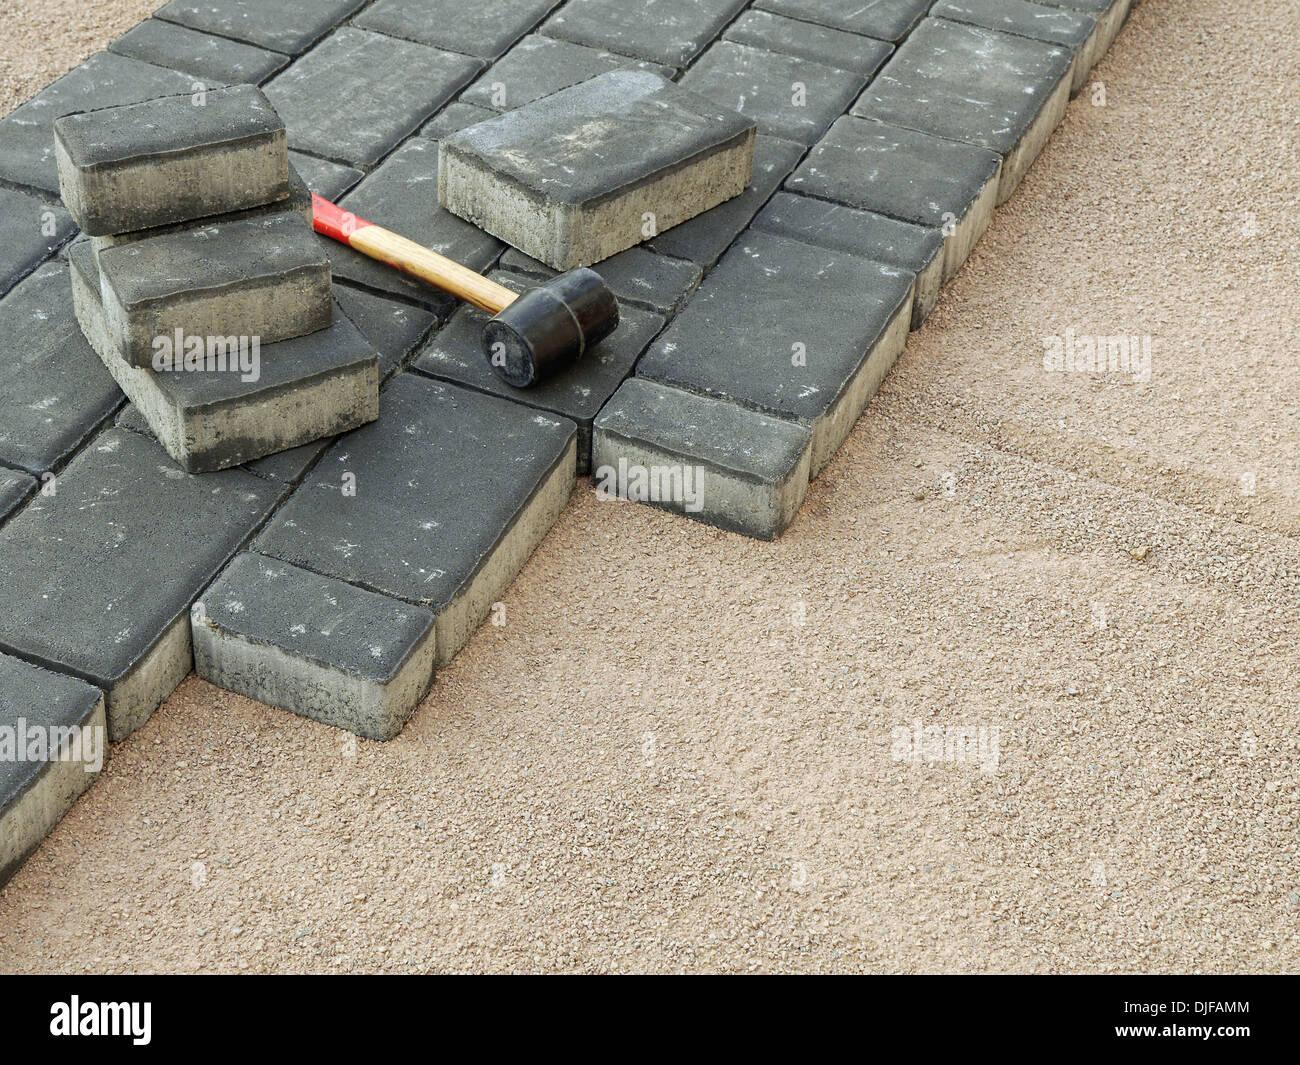 Laying Concrete Blocks Stock Photos & Laying Concrete Blocks